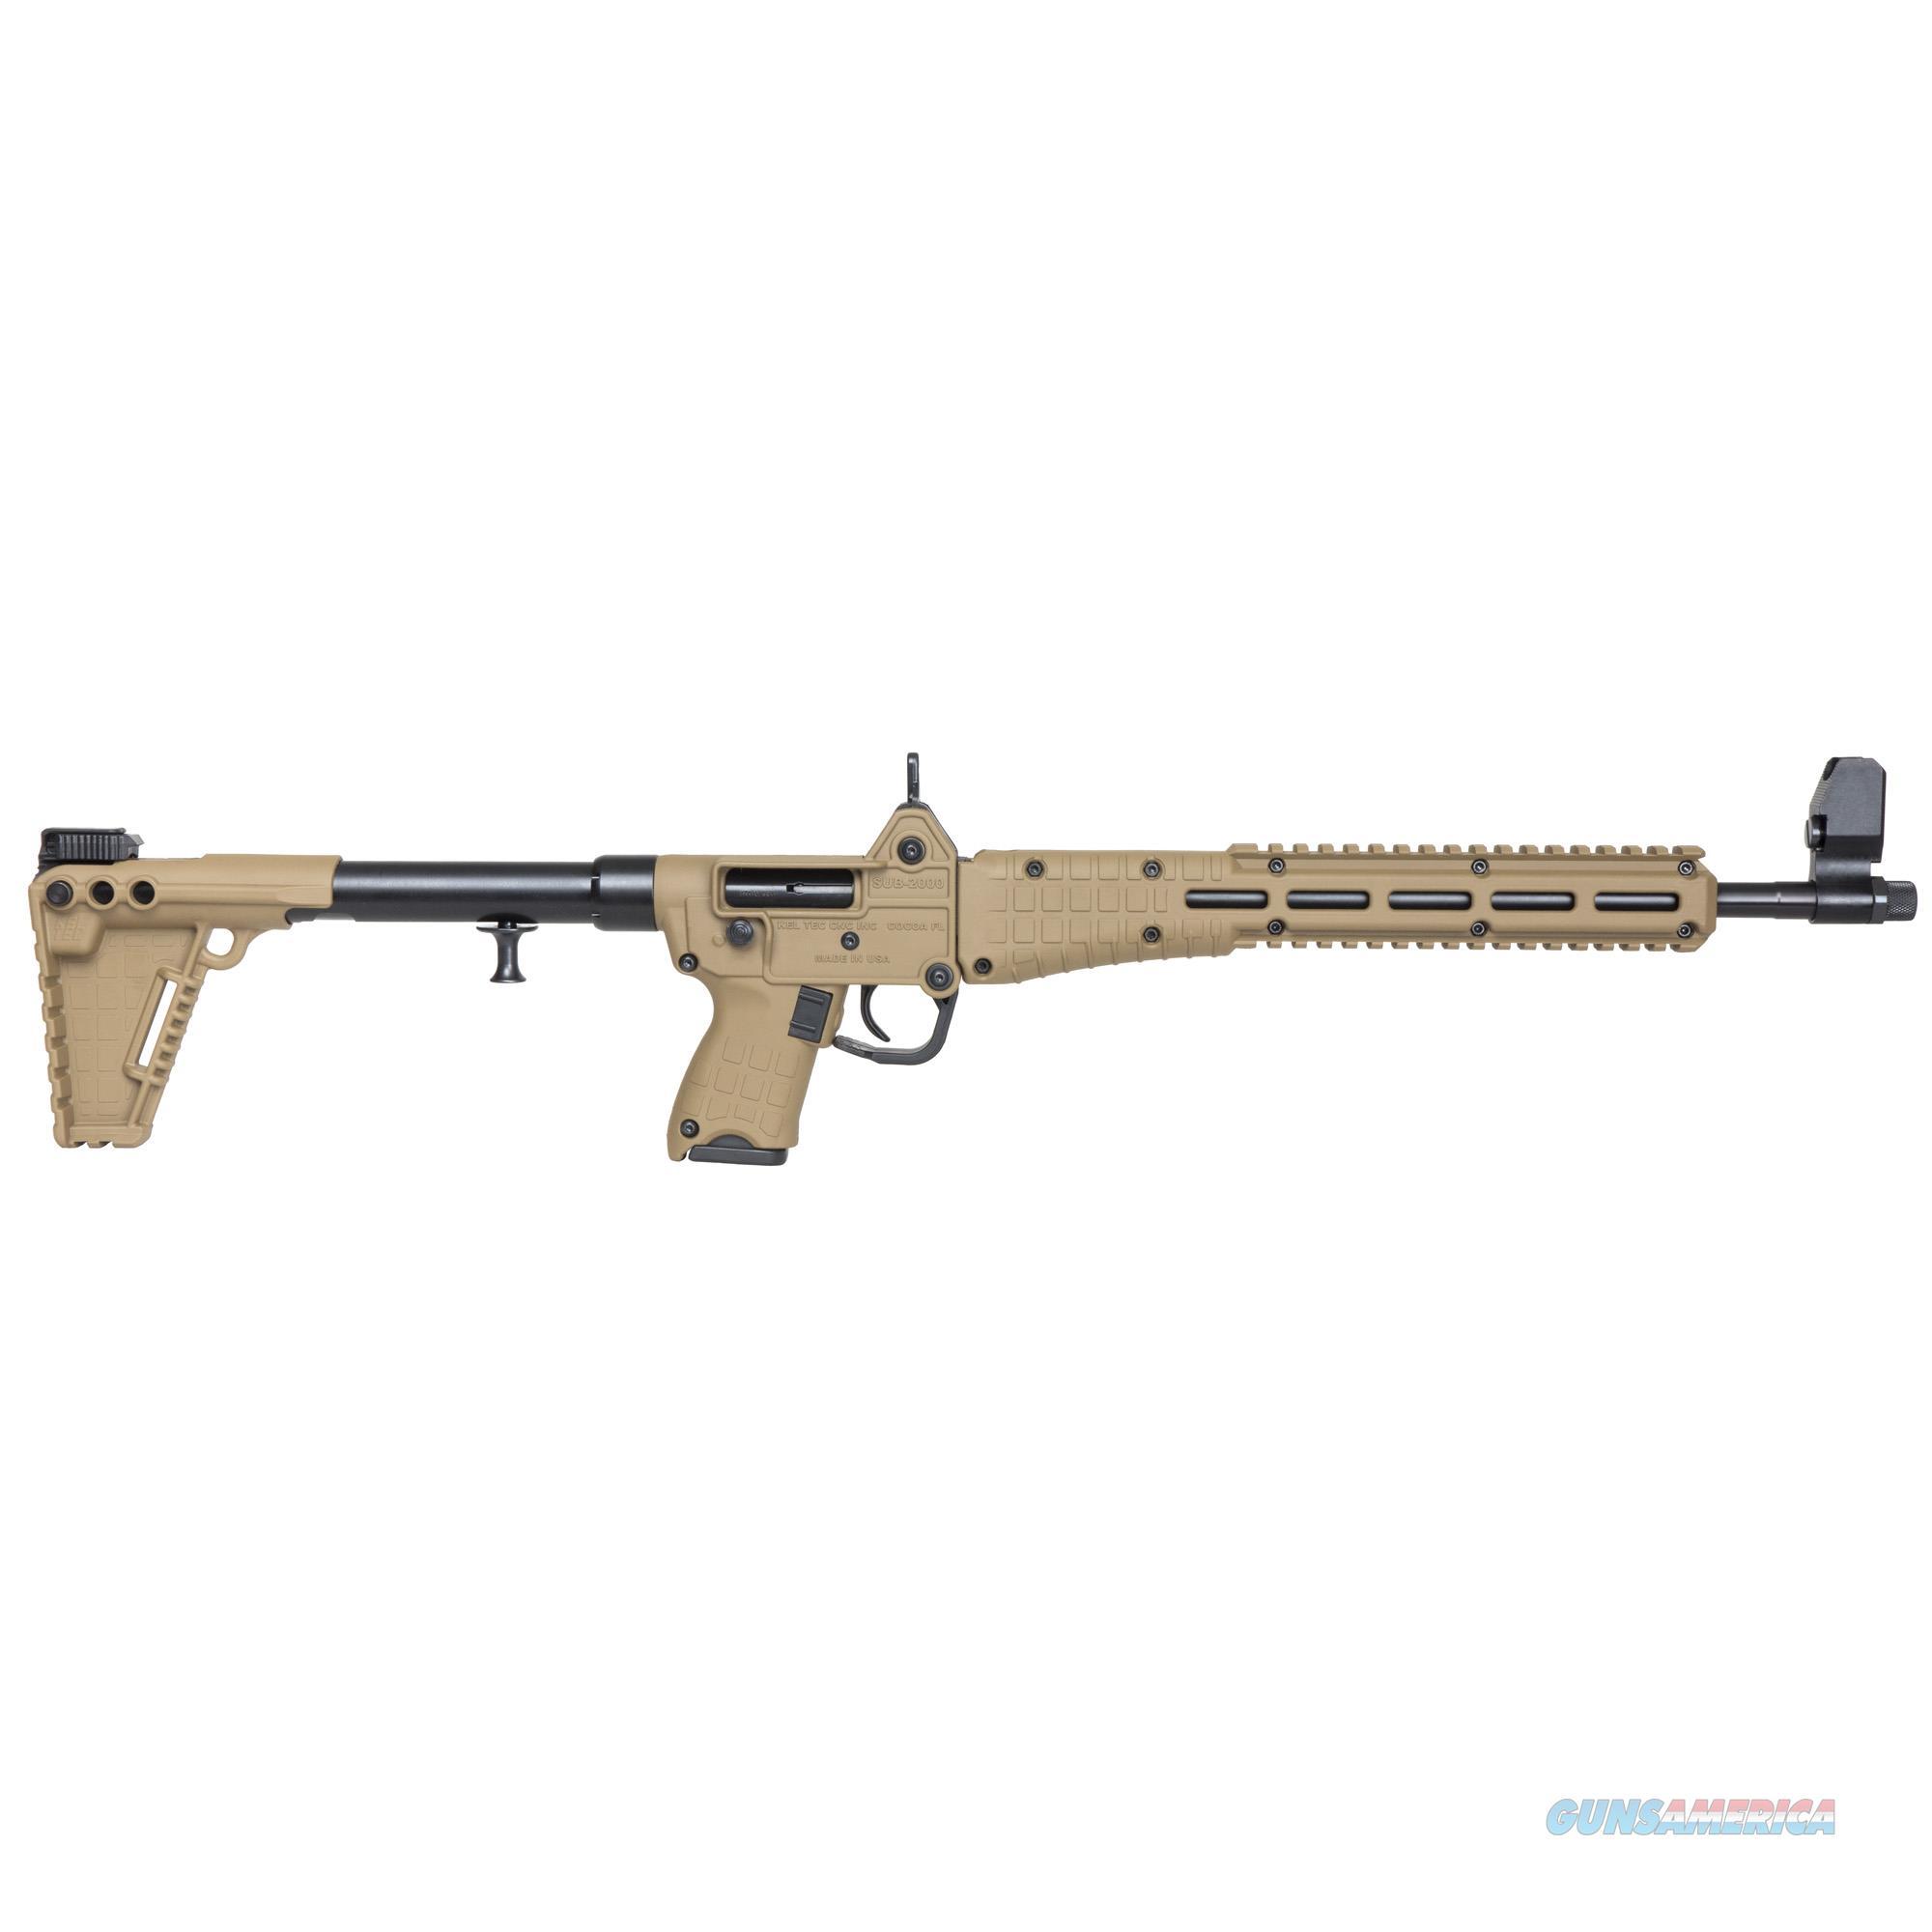 Kel-Tec Sub-2000 Gen 2 9mm TAN!  Guns > Rifles > Kel-Tec Rifles